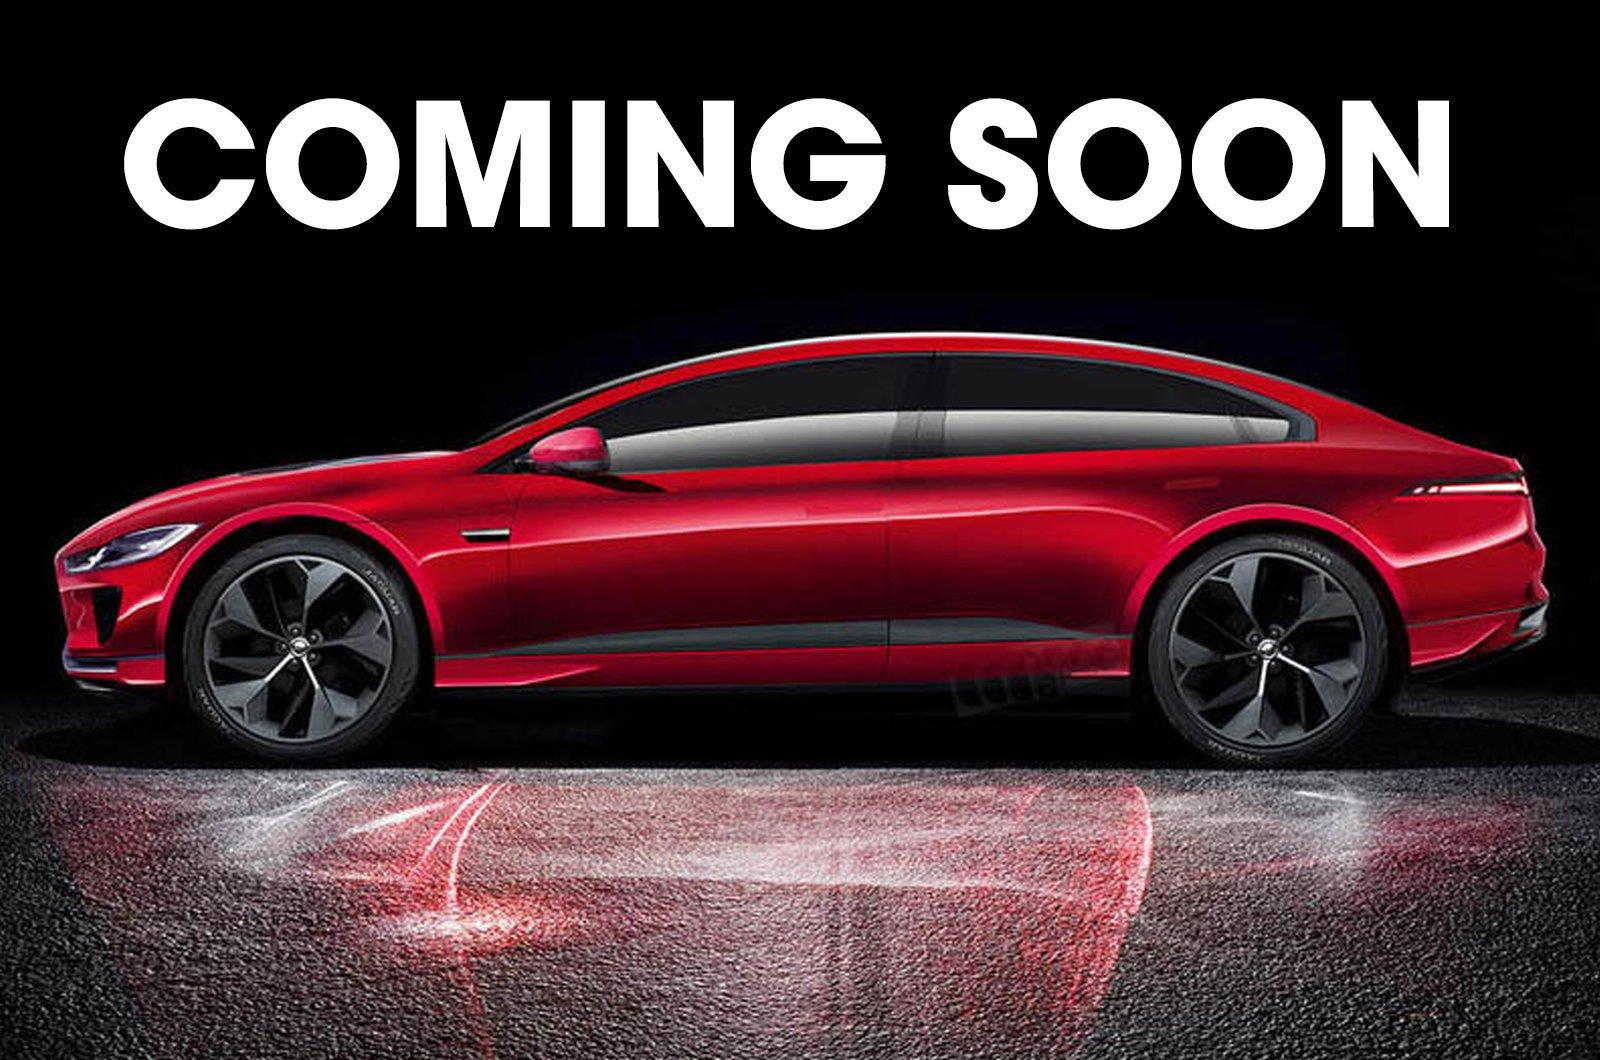 Coming soon: 2020 Jaguar XJ